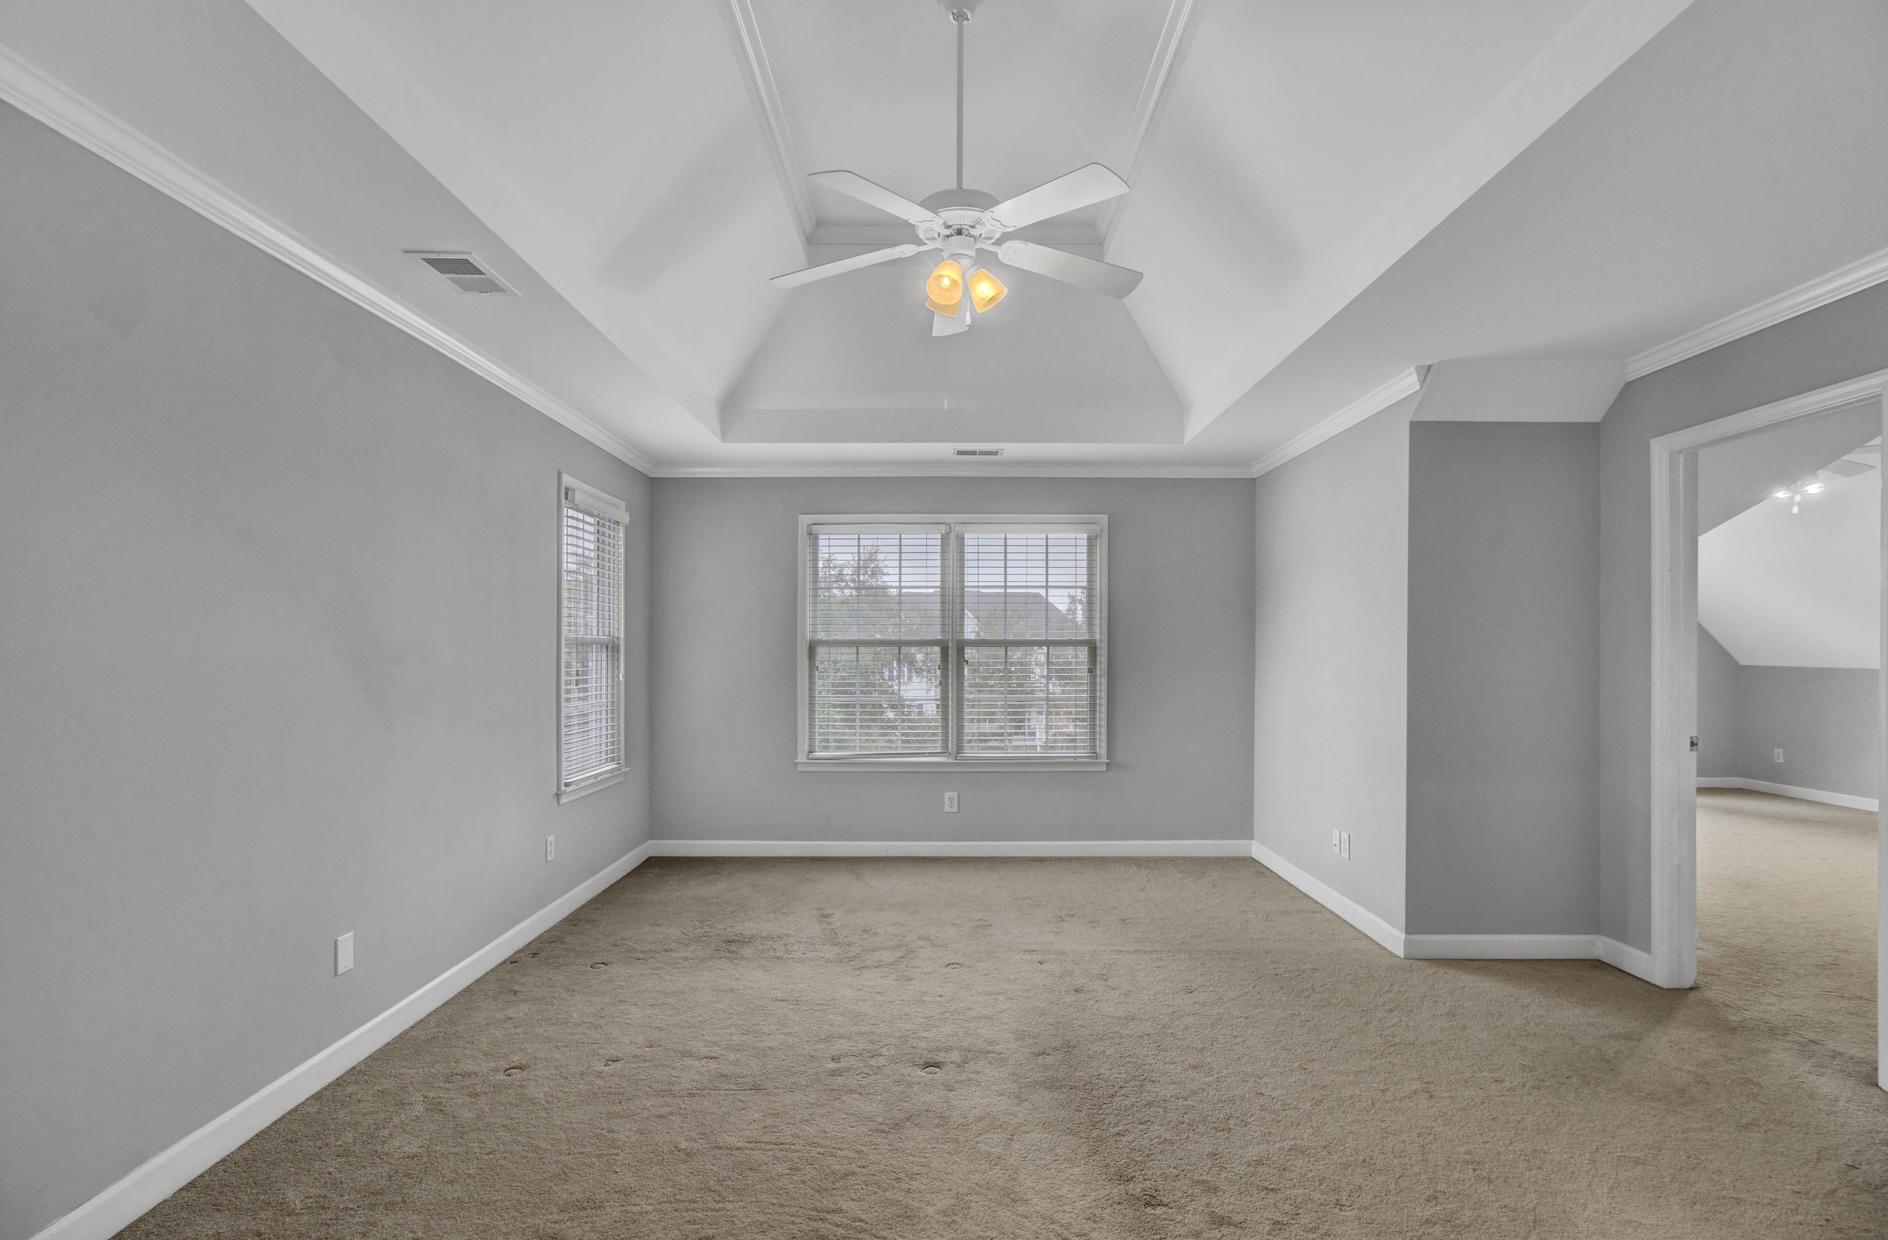 Dunes West Homes For Sale - 2321 Darts Cove, Mount Pleasant, SC - 23